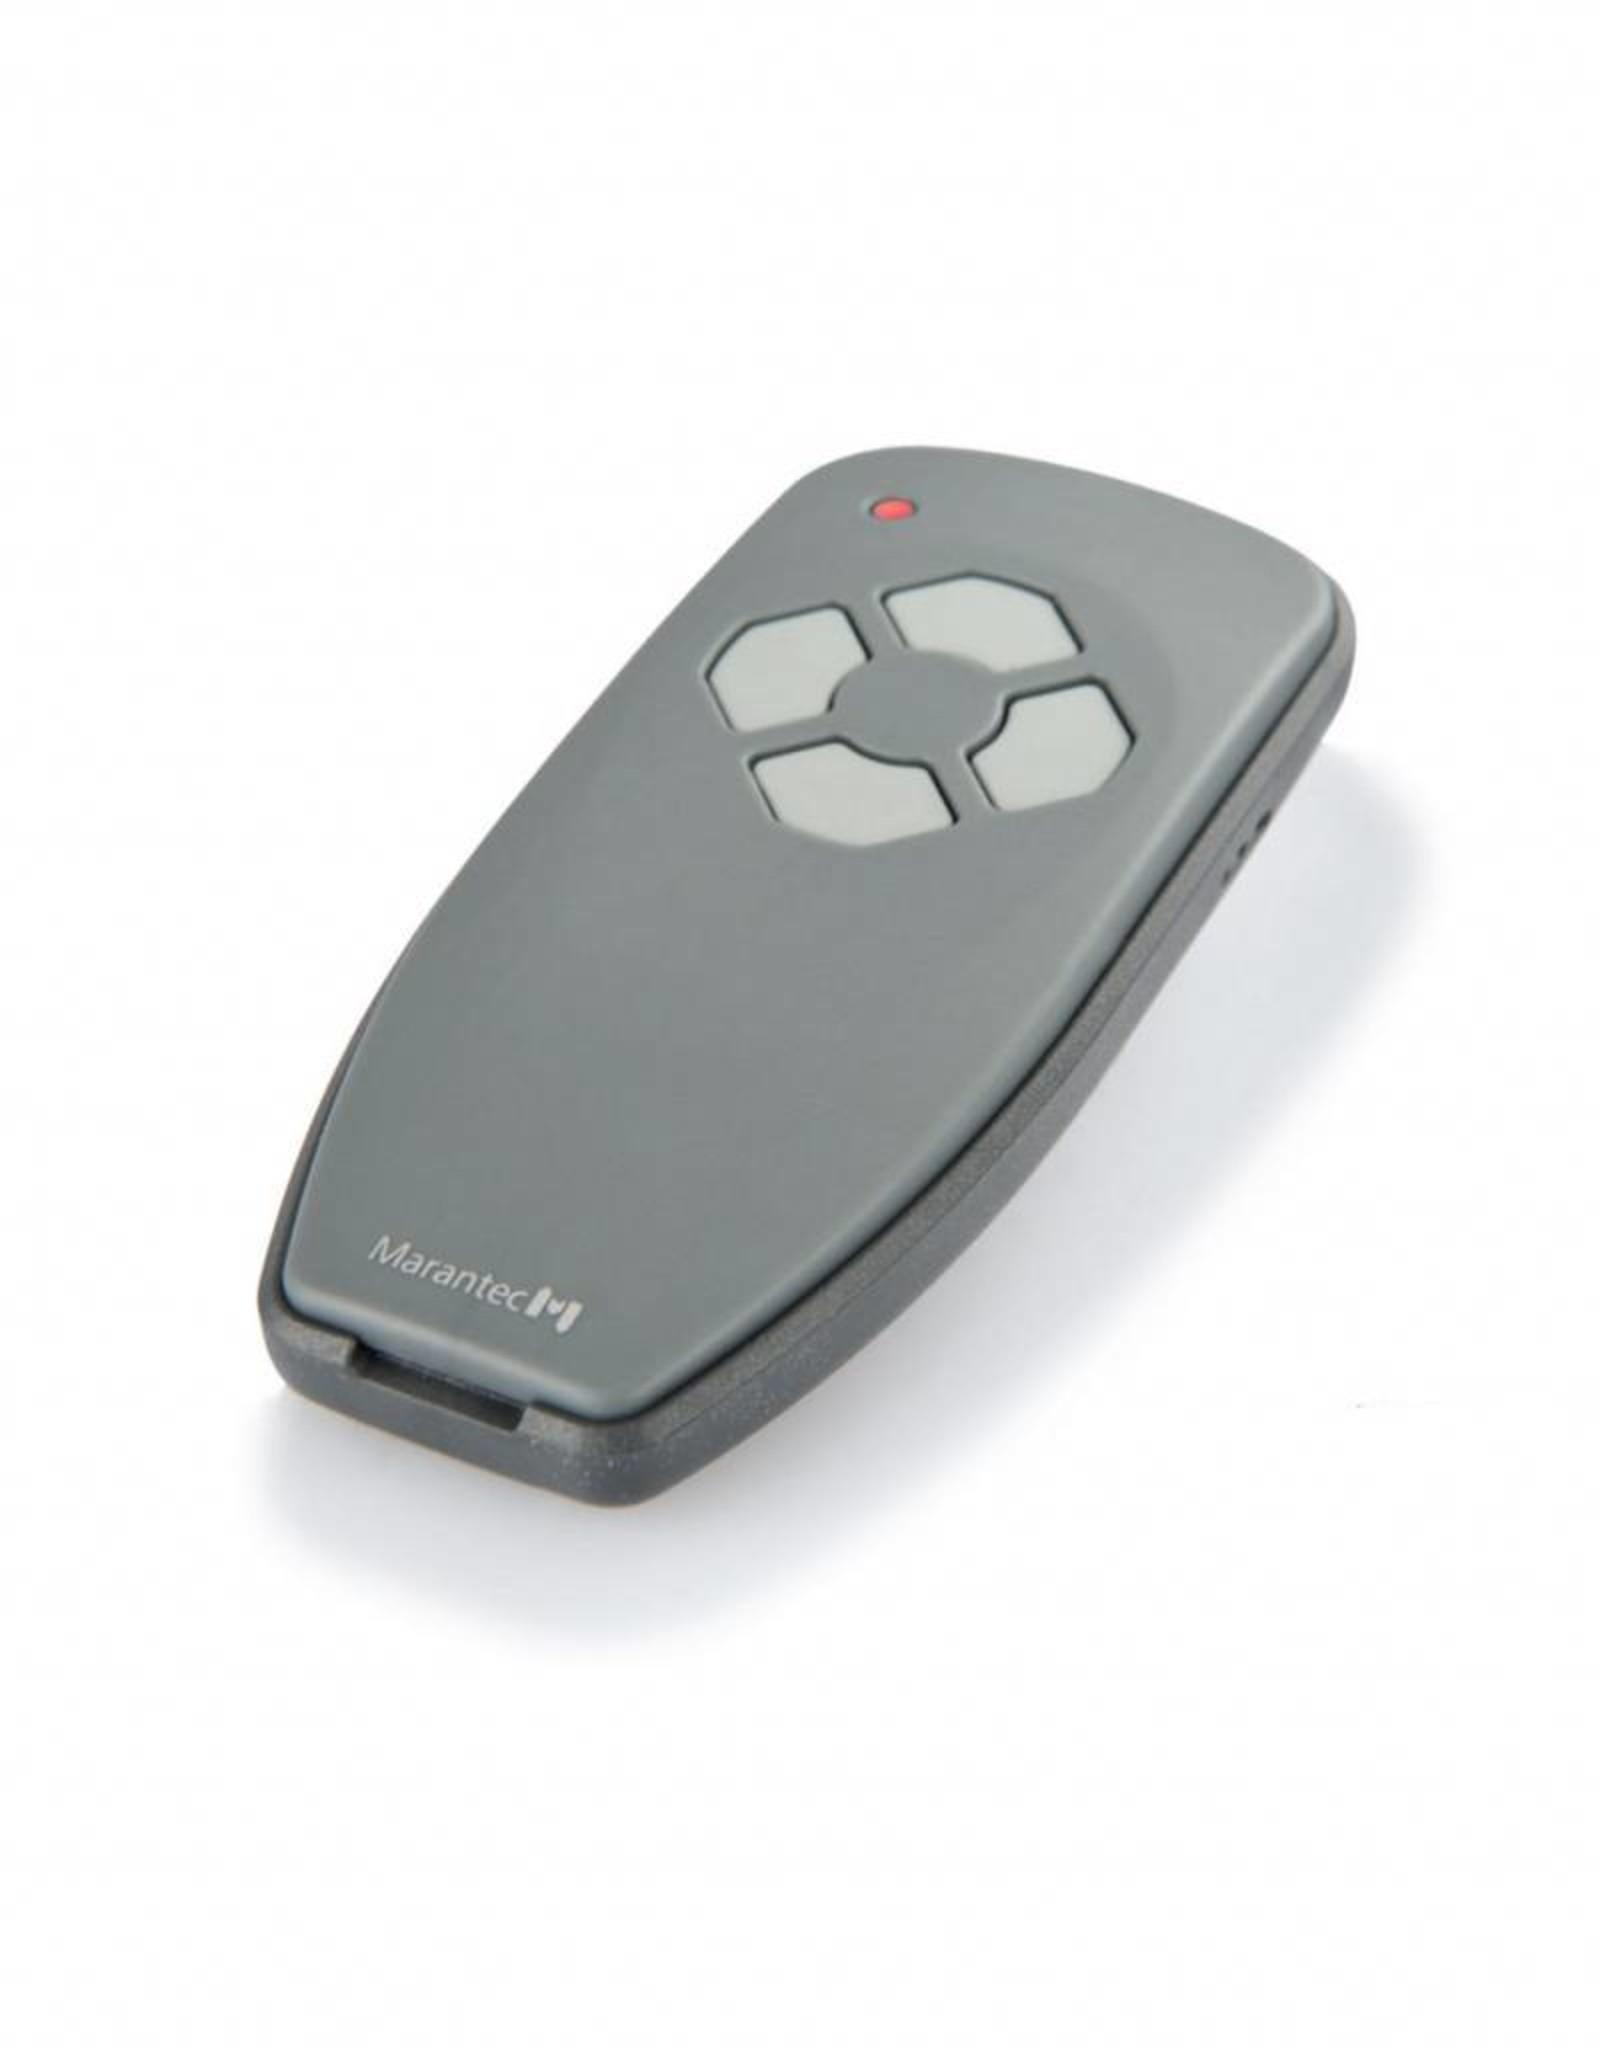 Marantec Marantec Digital 384 Multi-bit 4 kanaals handzender - 433 MHz